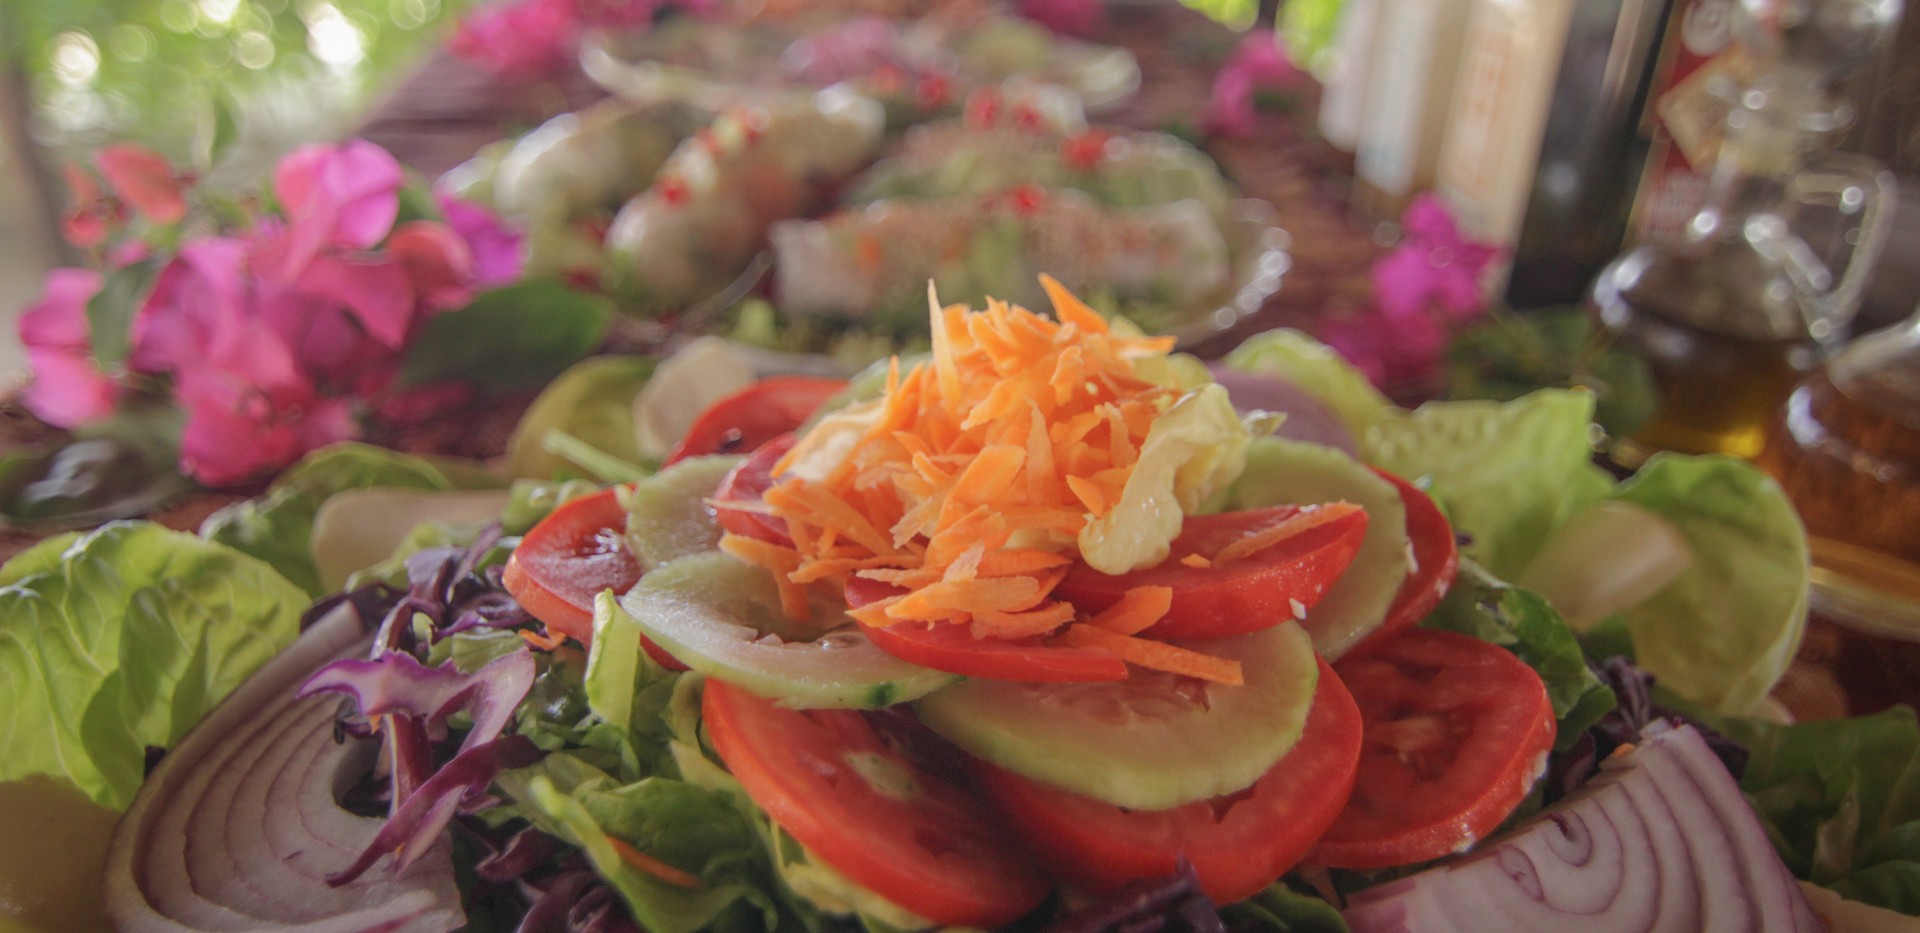 Comida Vegetariana Bambuddha Holistic Ce